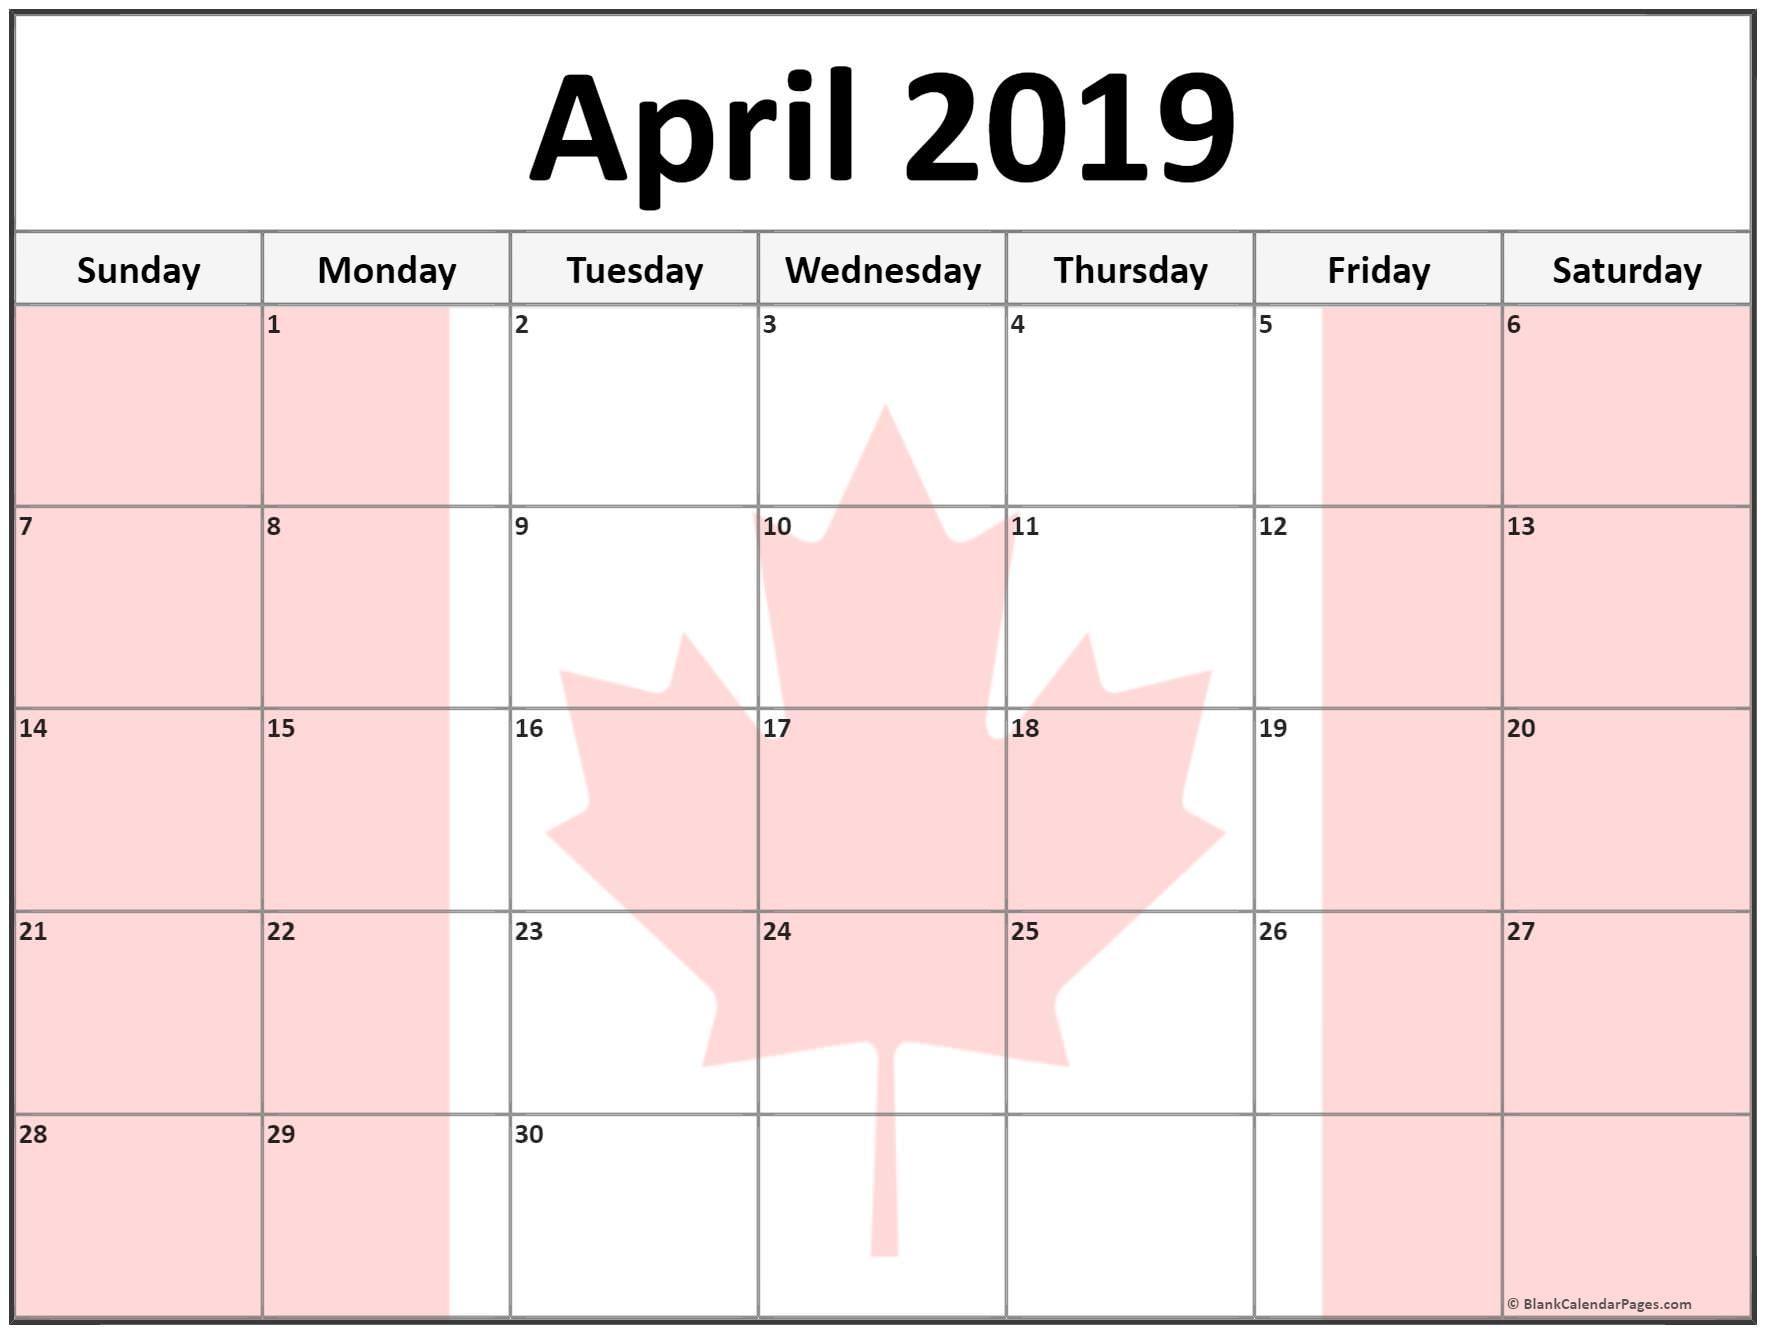 April 2019 Calendar Canada Printable Aprilcalendar2019